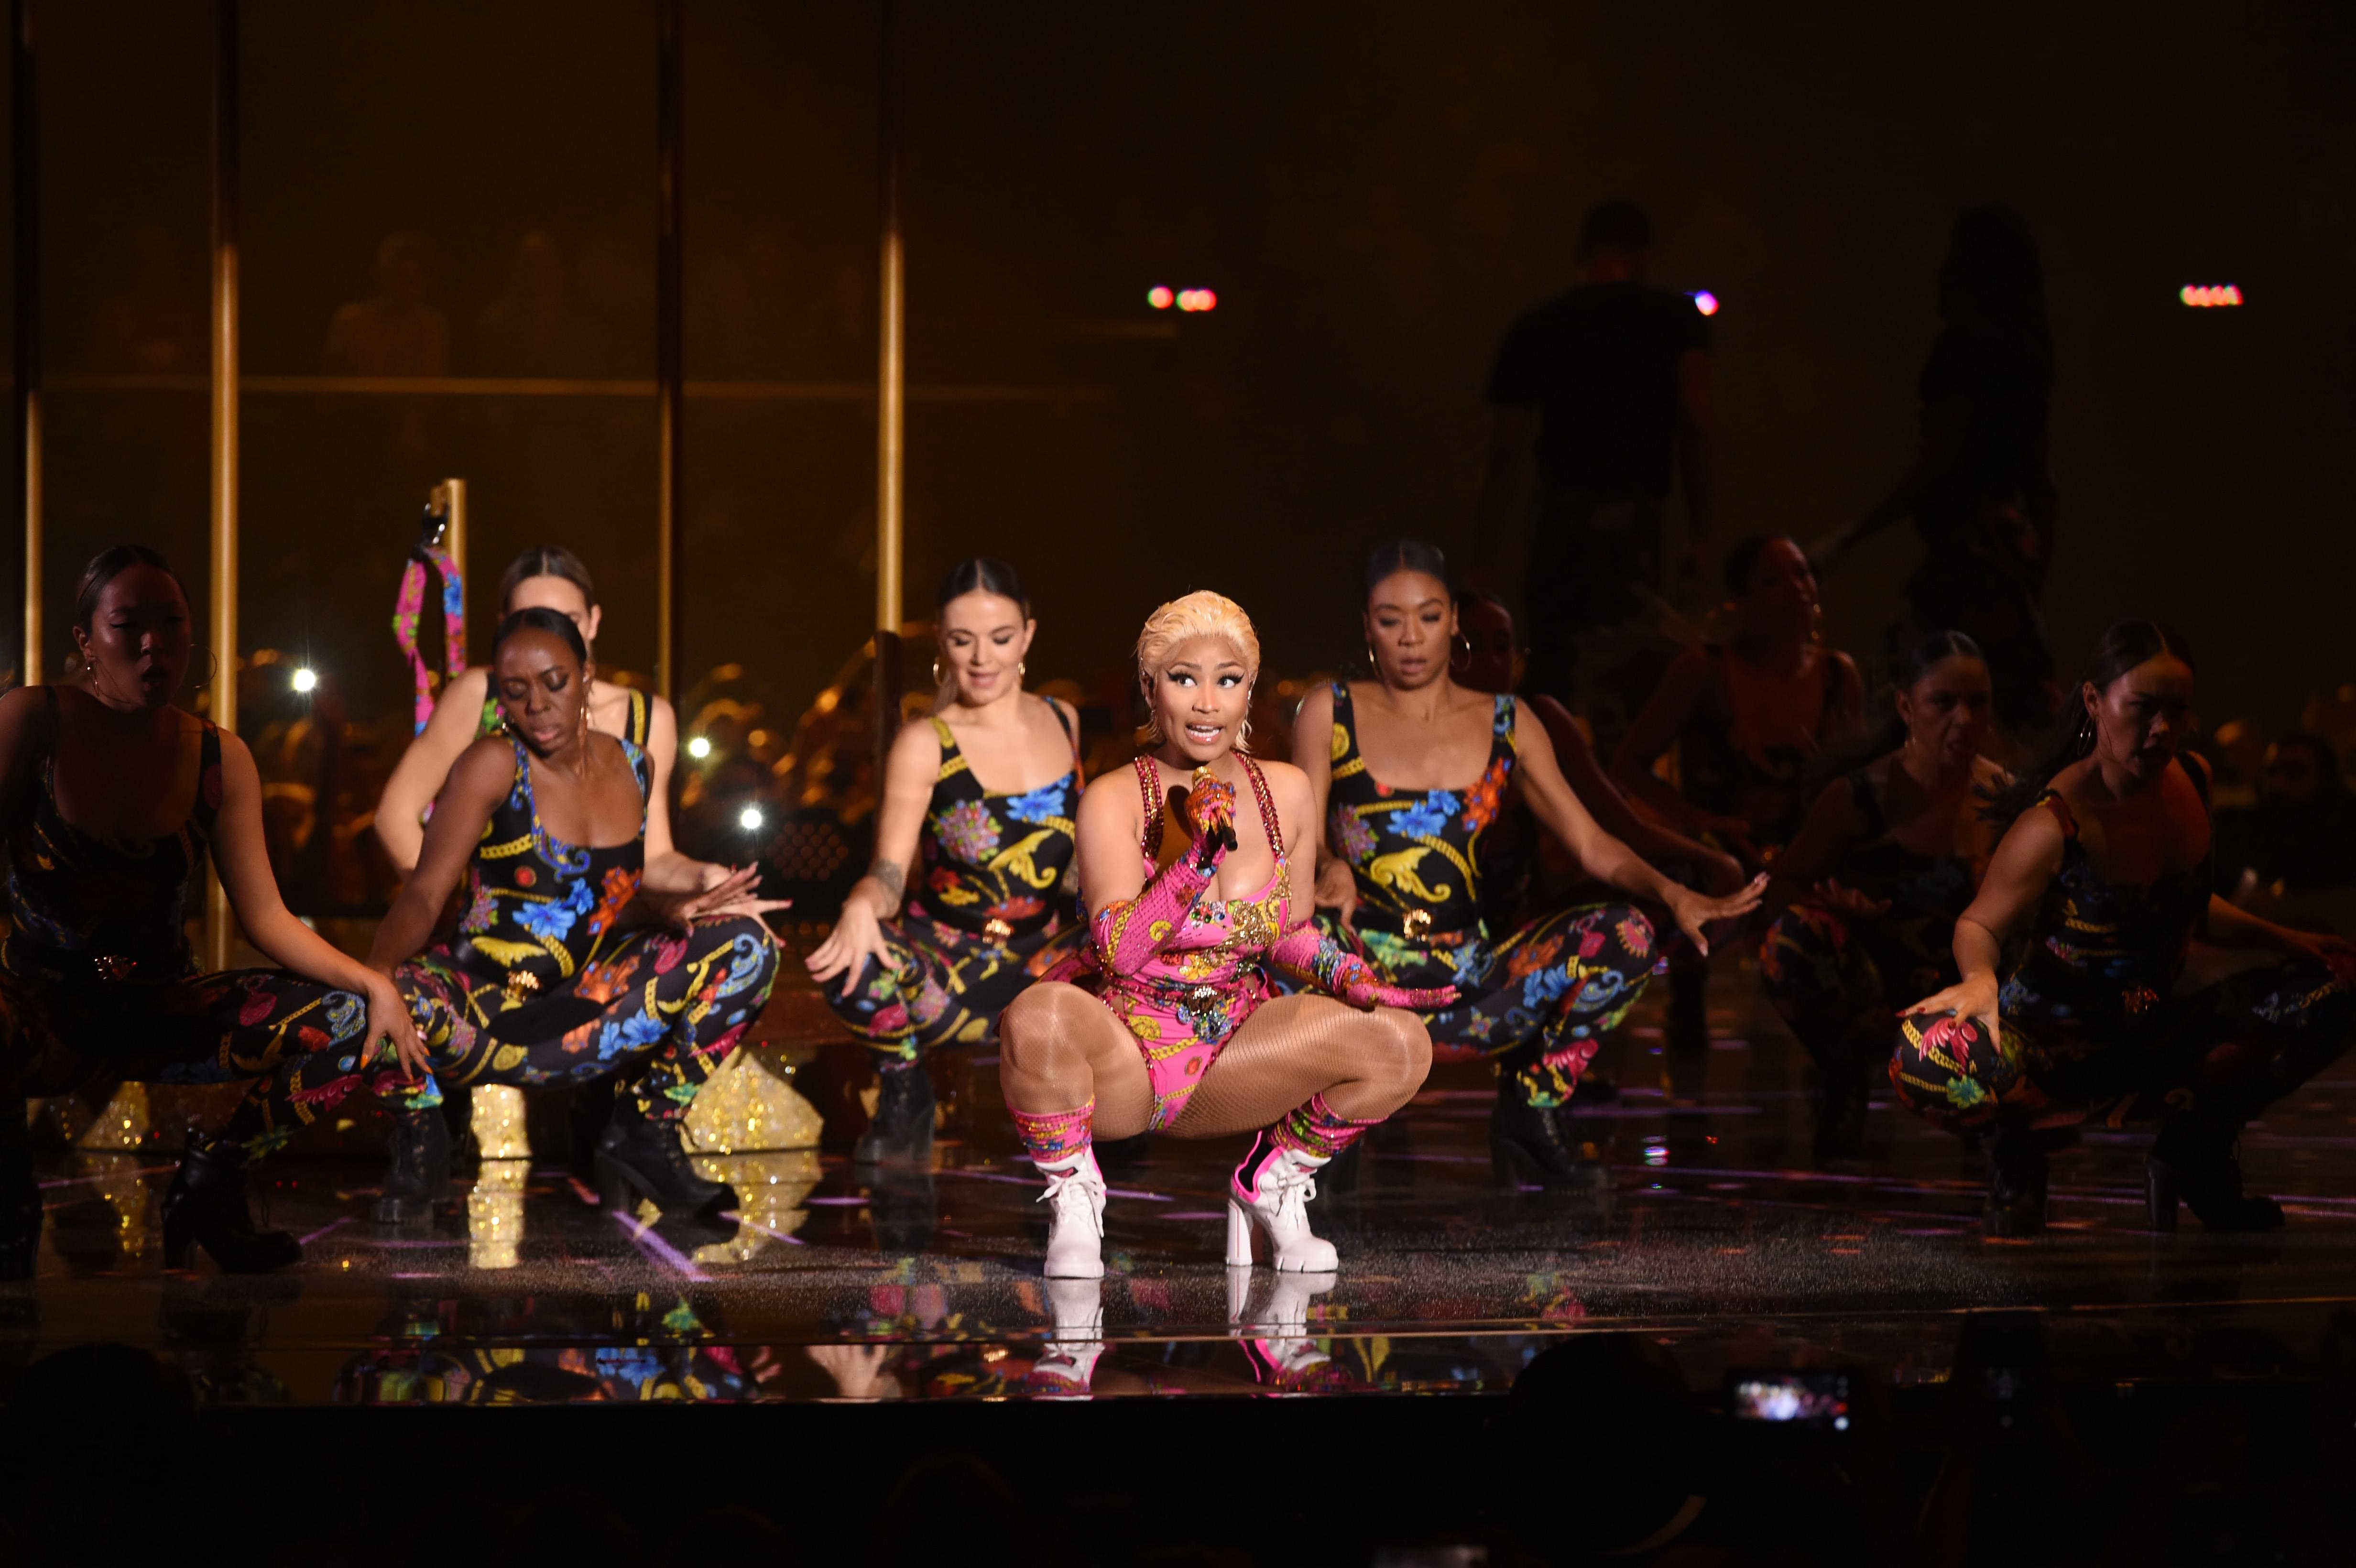 Nicki Minaj Is Already Talking Wedding Plans With Her New Bae!?